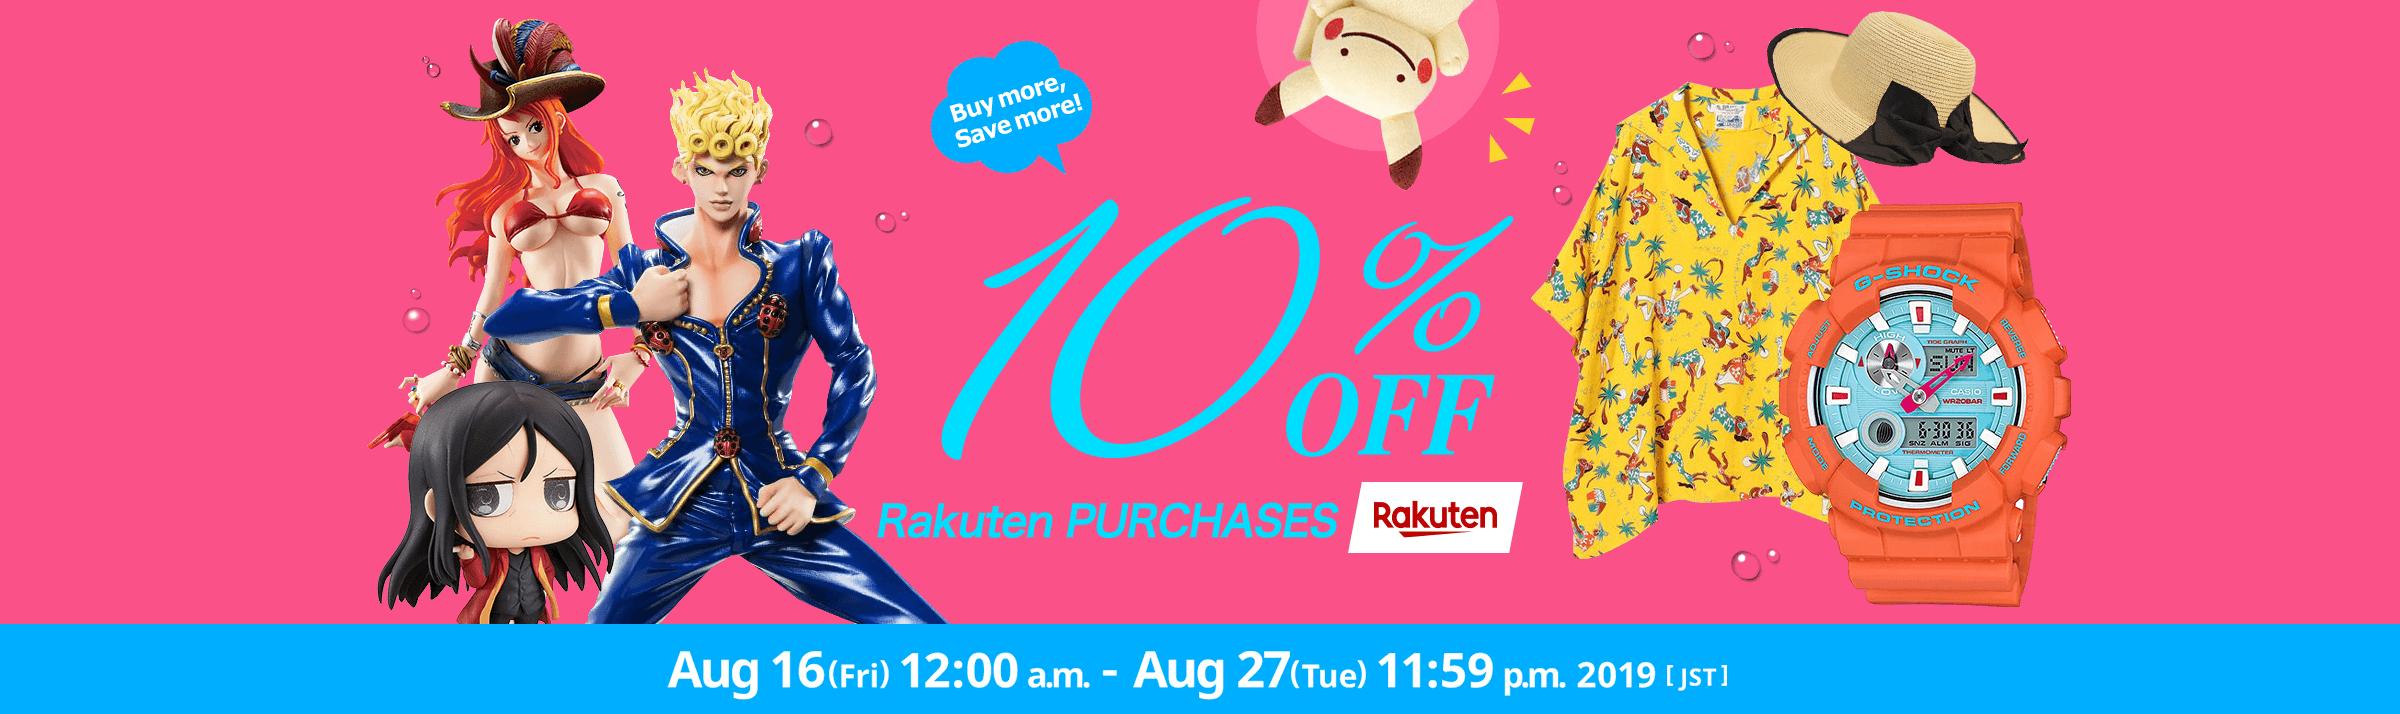 Rakuten 10% Off Campaign